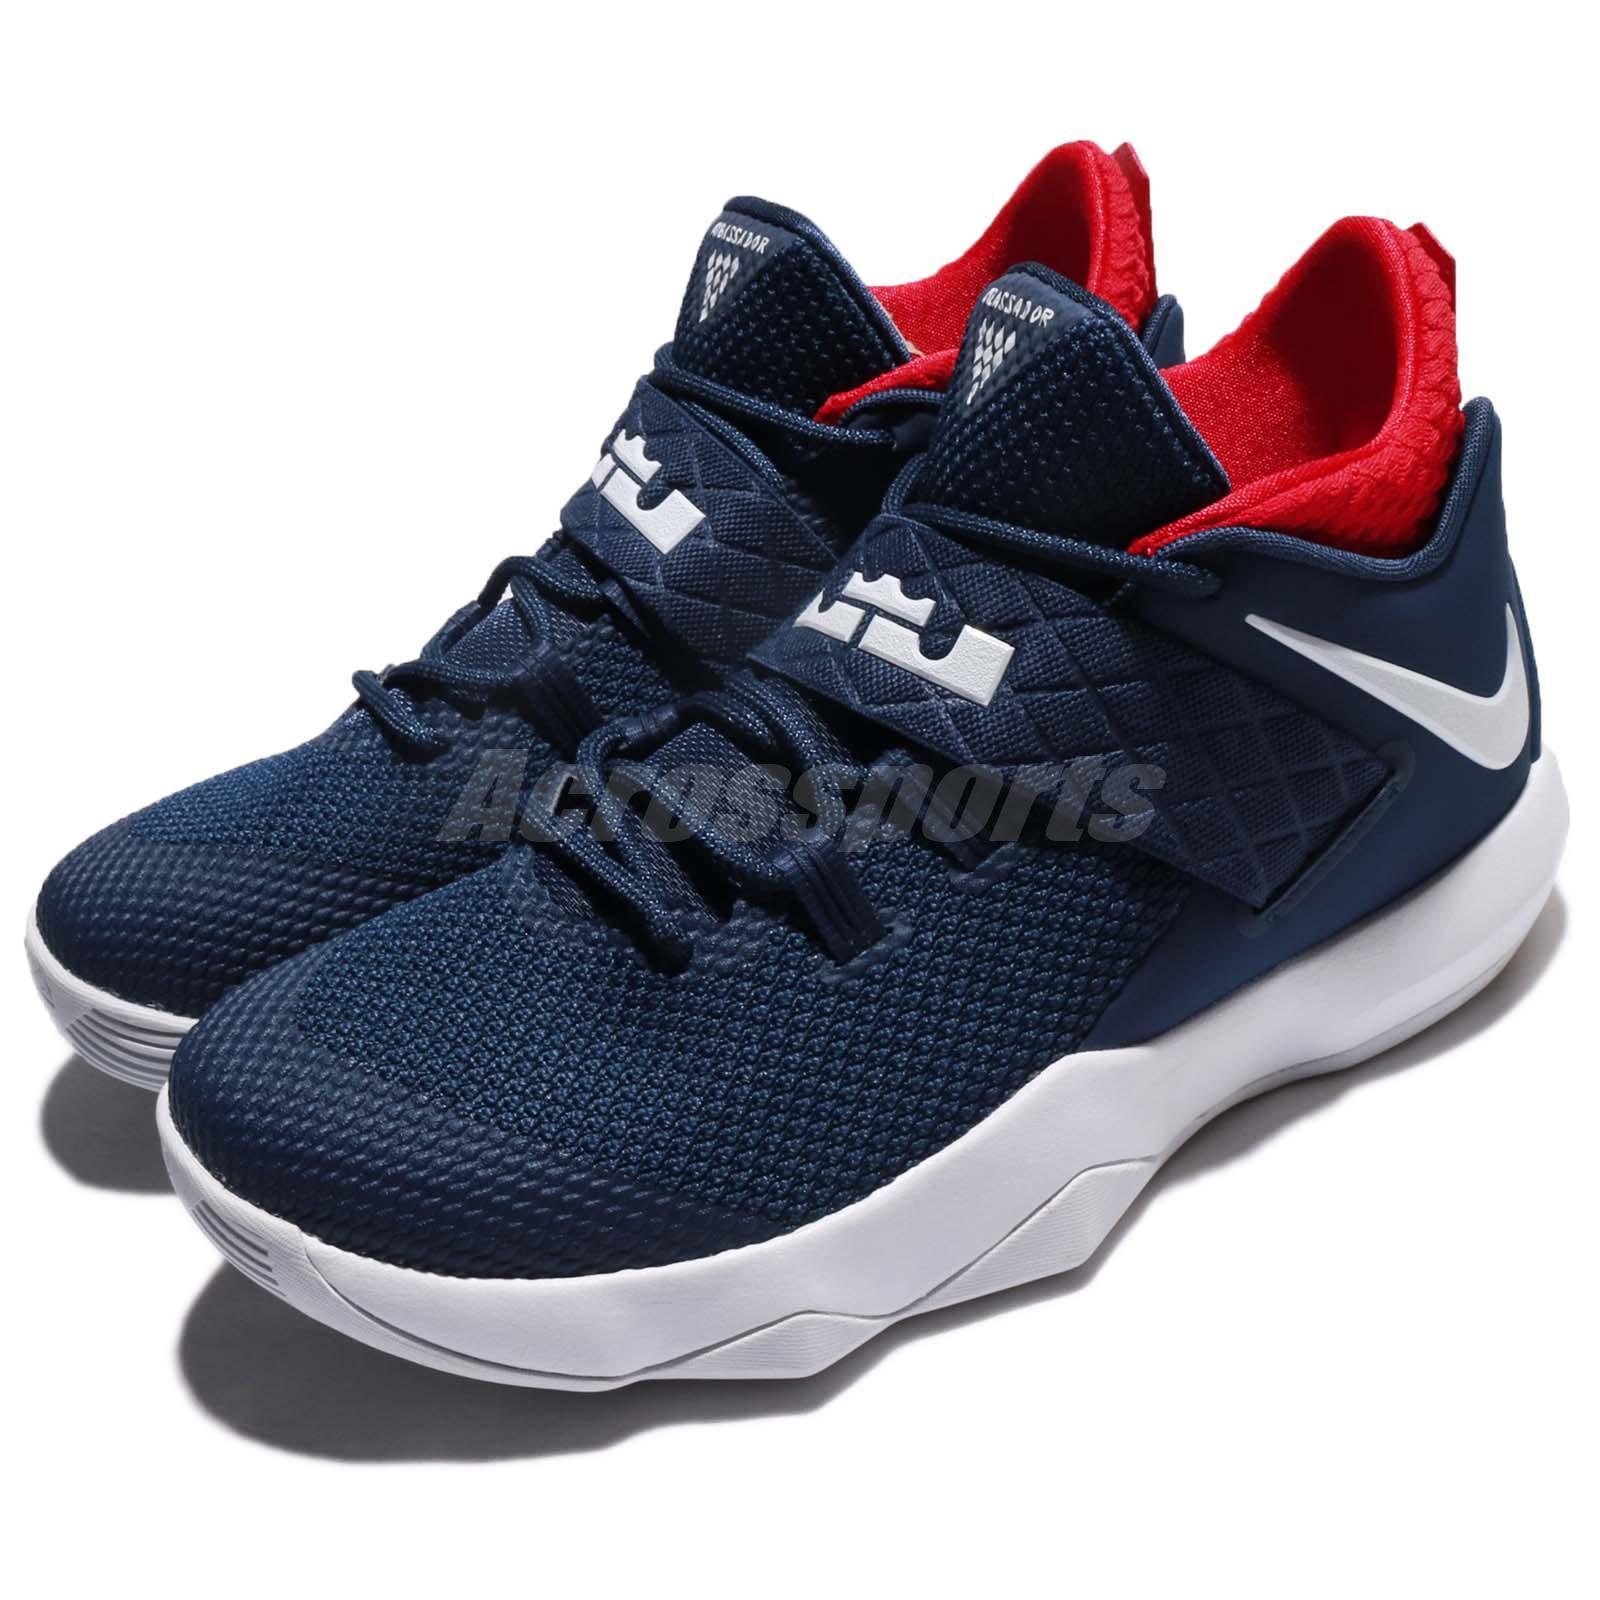 Nike Ambassador X 10 Lebron James USA Navy Red Men ...